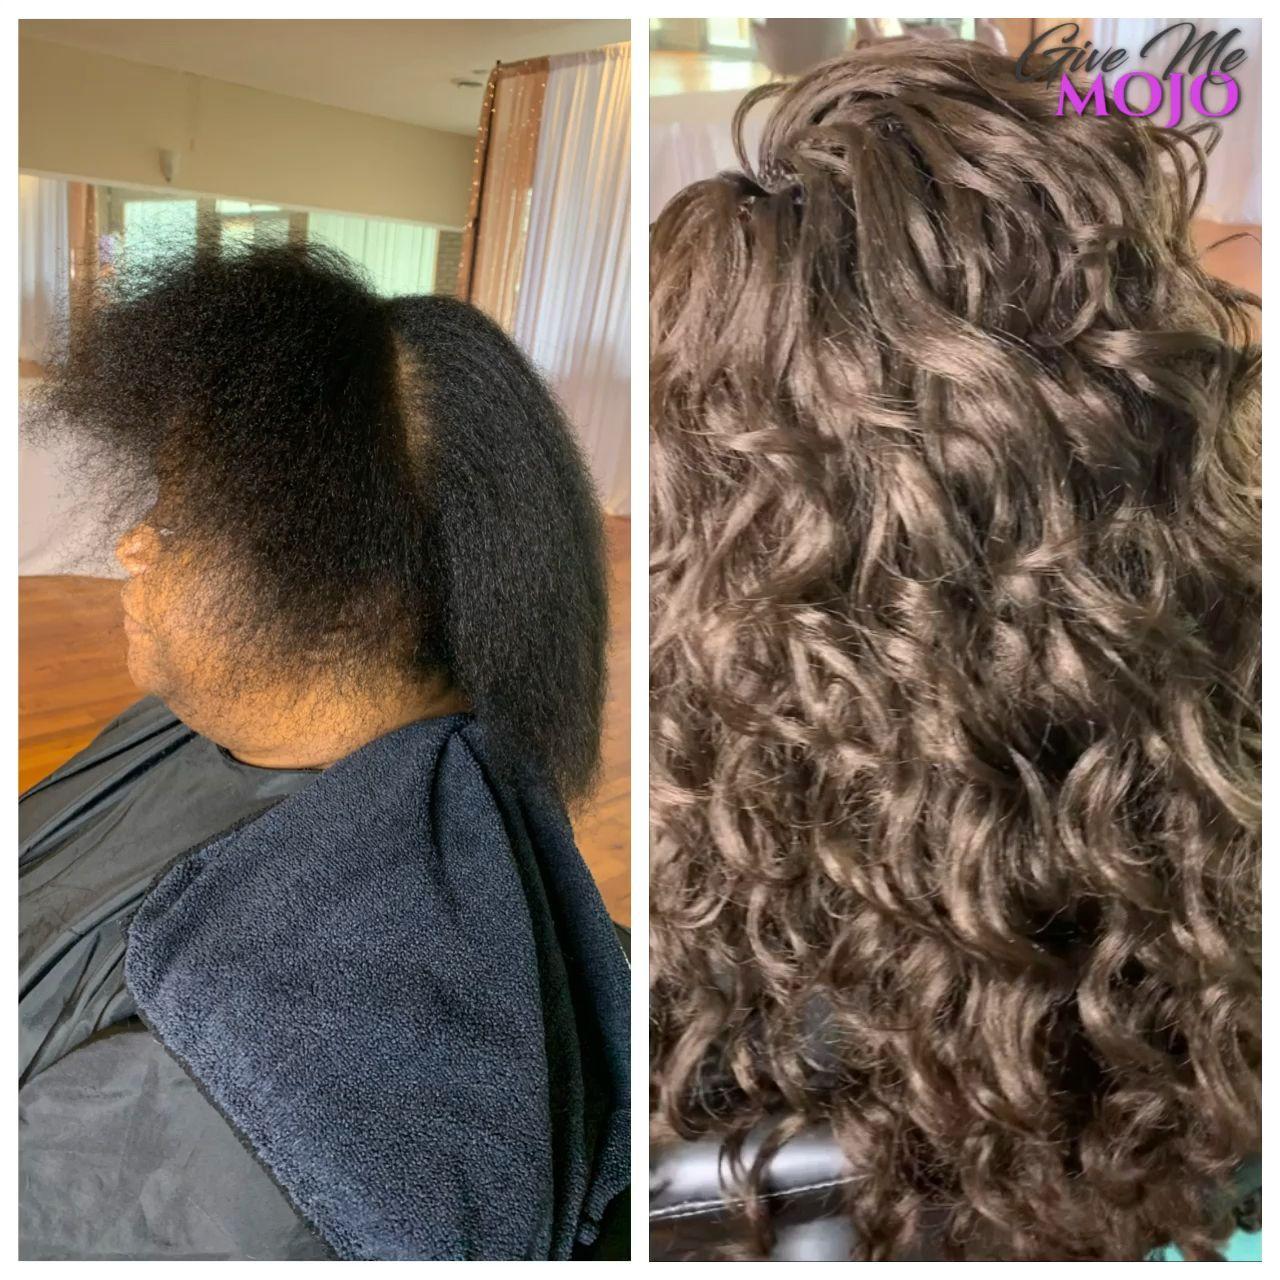 #naturalhairstyles #teamnatural #crochethairstyles #bodywave #crochethair  #naturalhair  #hairtrends #hairfashion